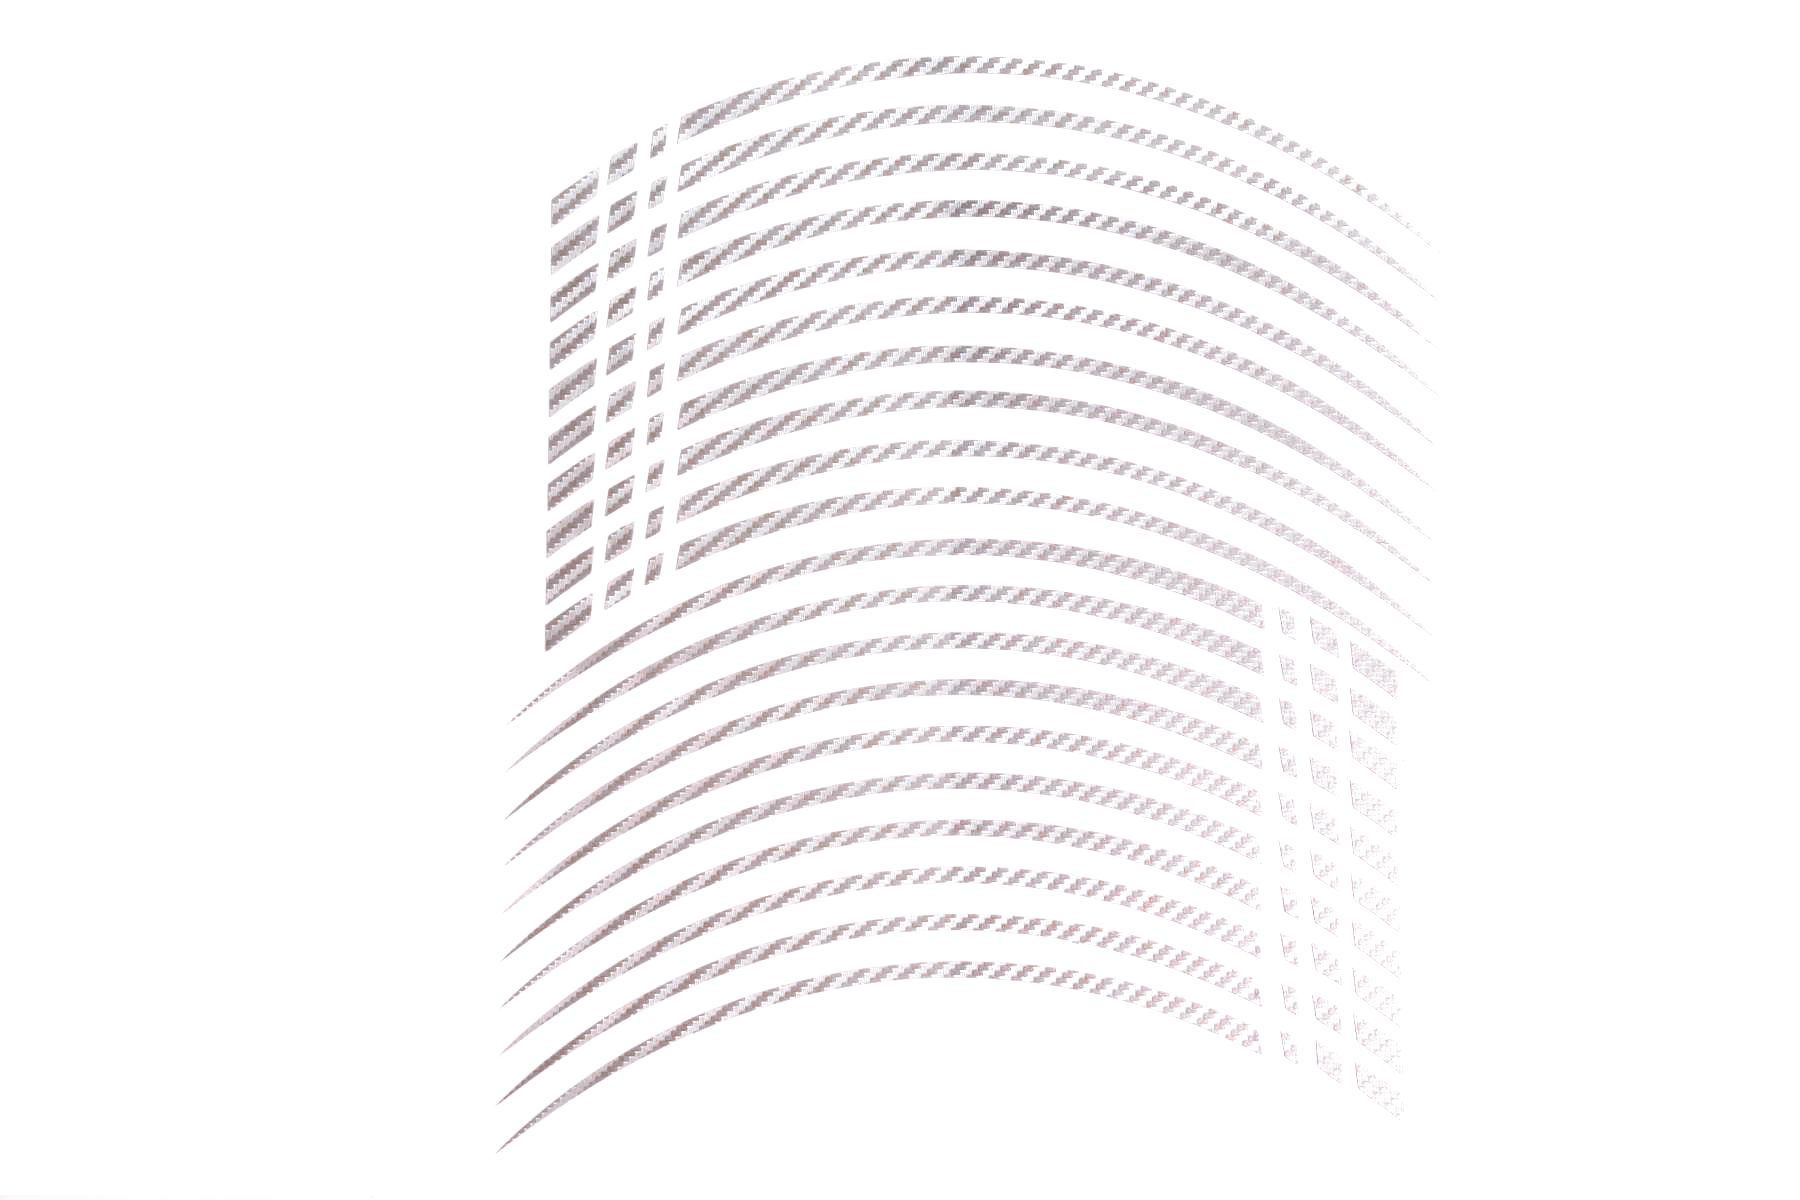 Gp2 16 Felgenaufkleber In Der Farbe Carbon Silber